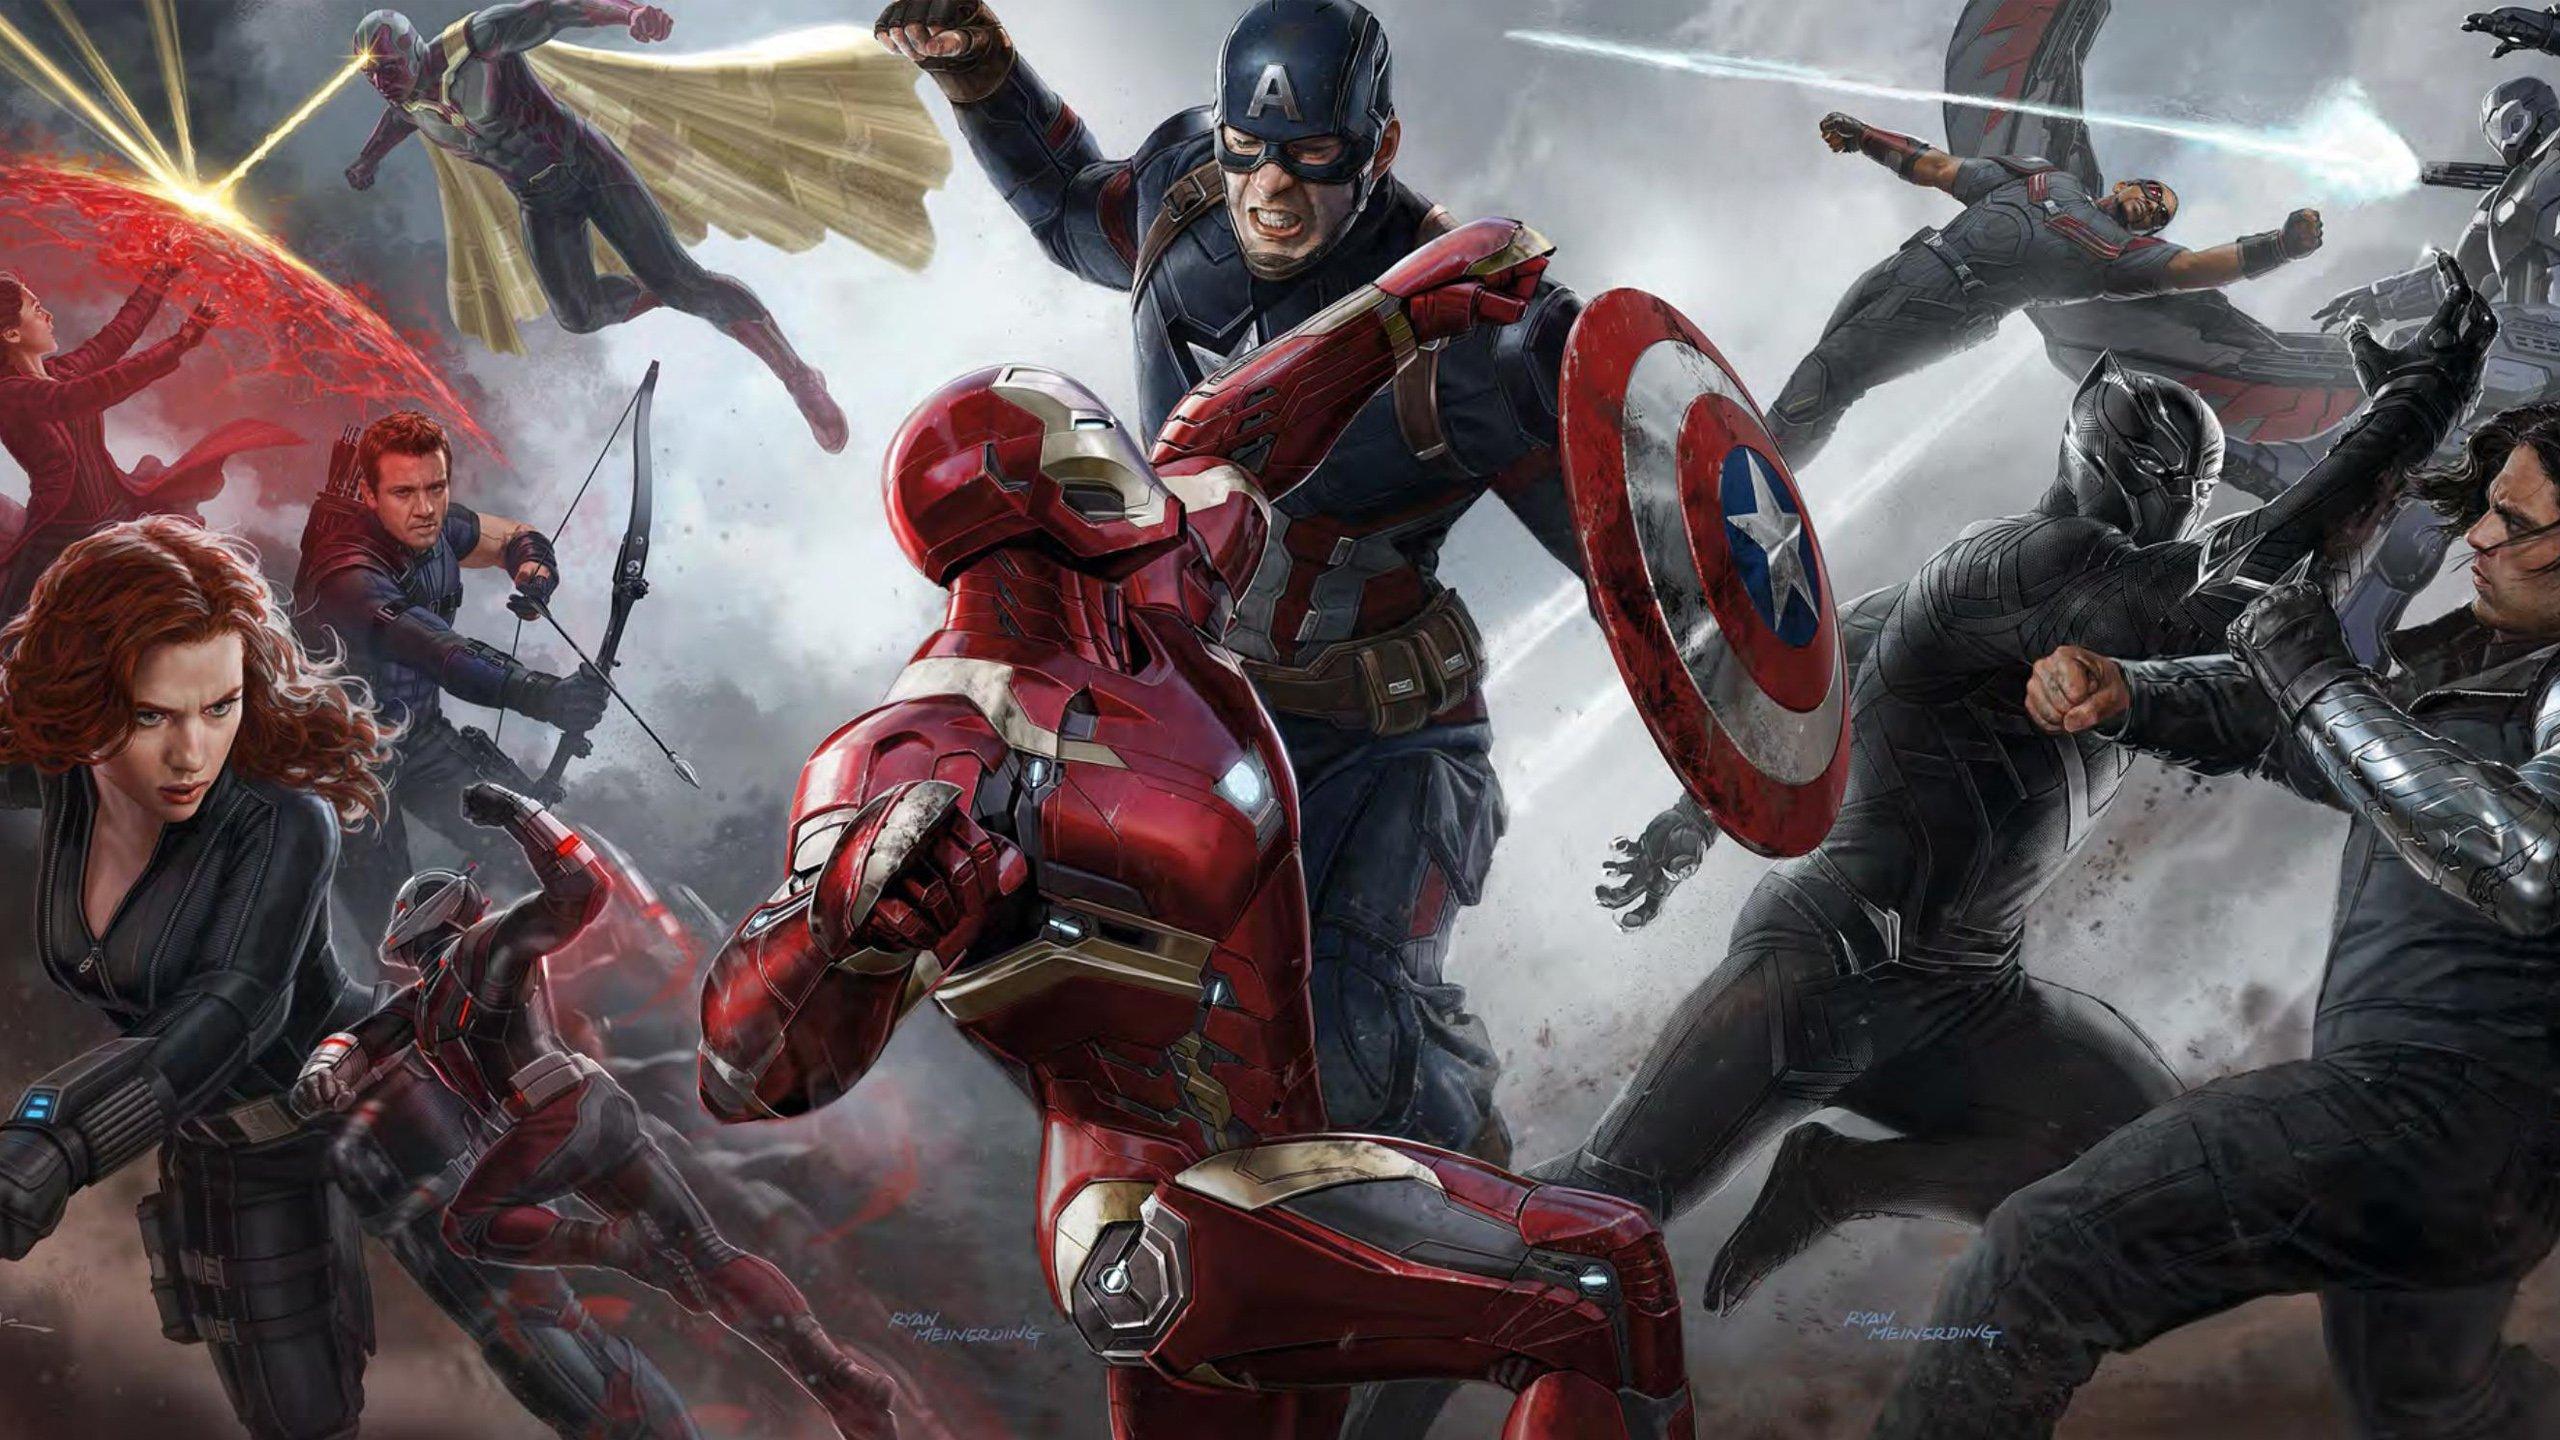 Captain America Civil War Concept Art Wallpapers HD Wallpapers 2560x1440